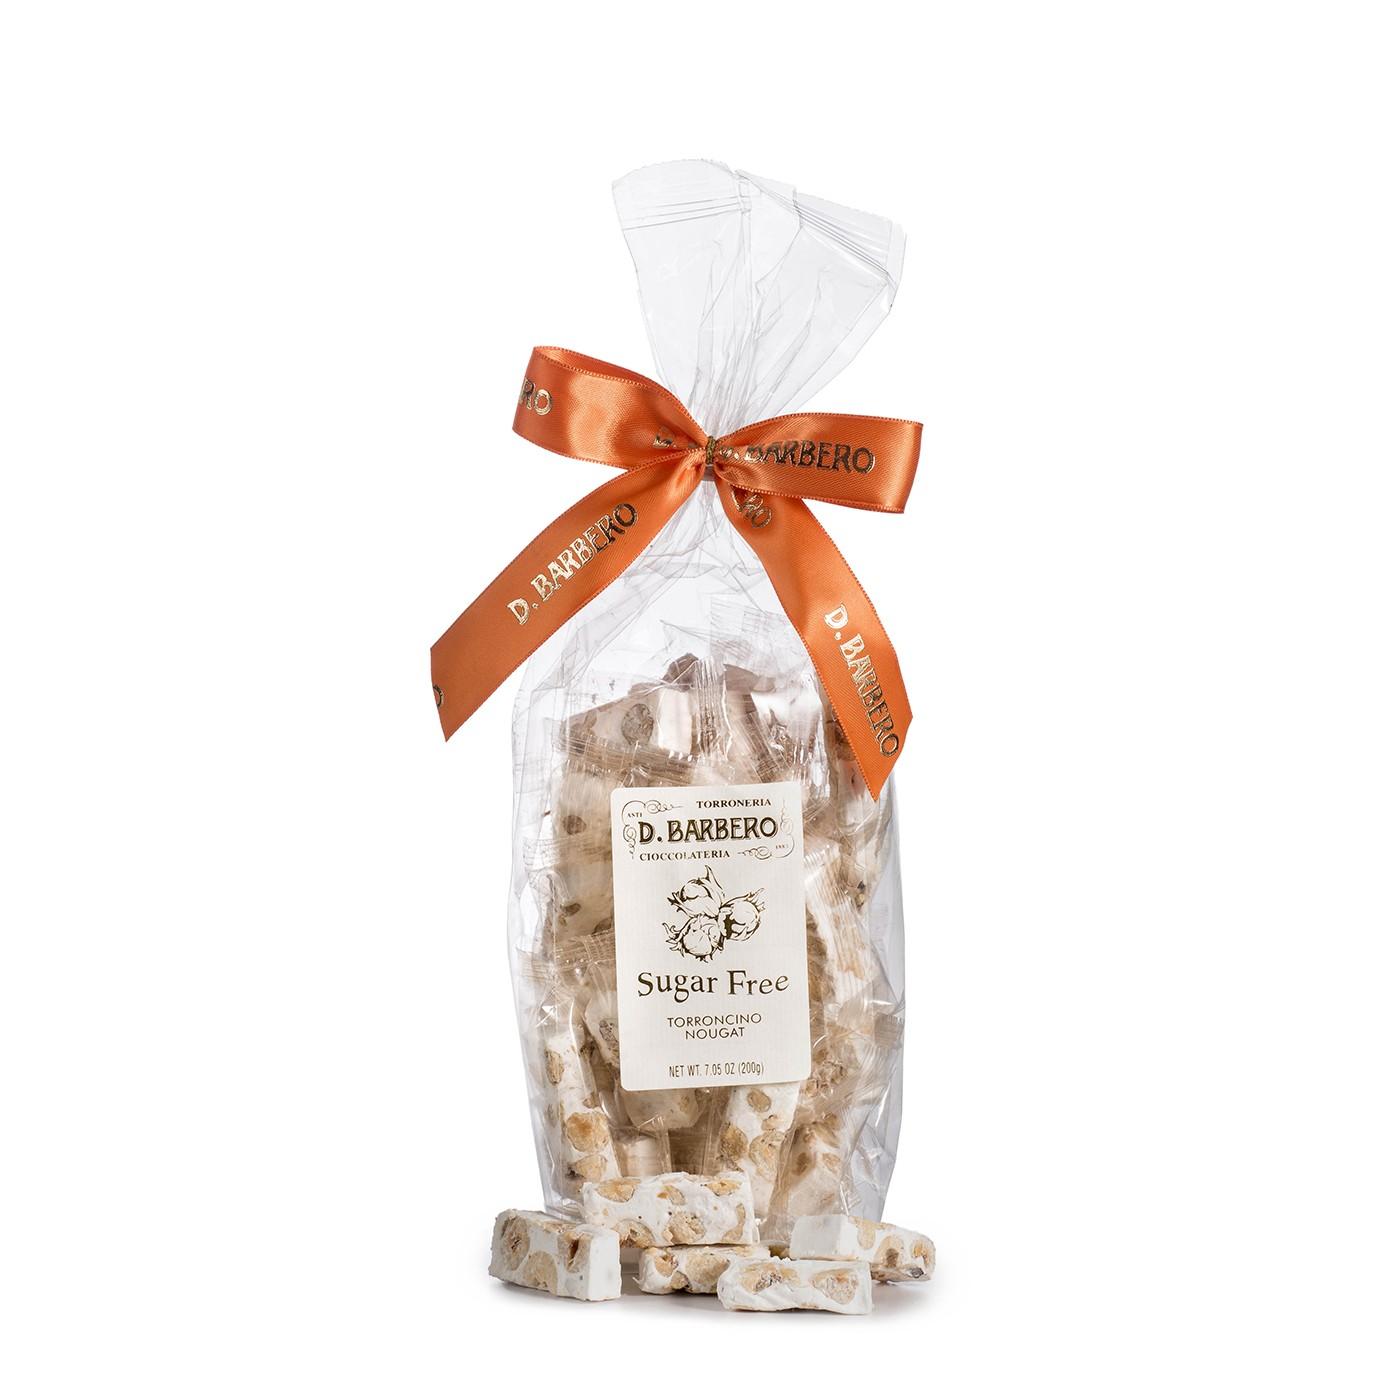 Sugar-Free Torroncino 7.1 oz